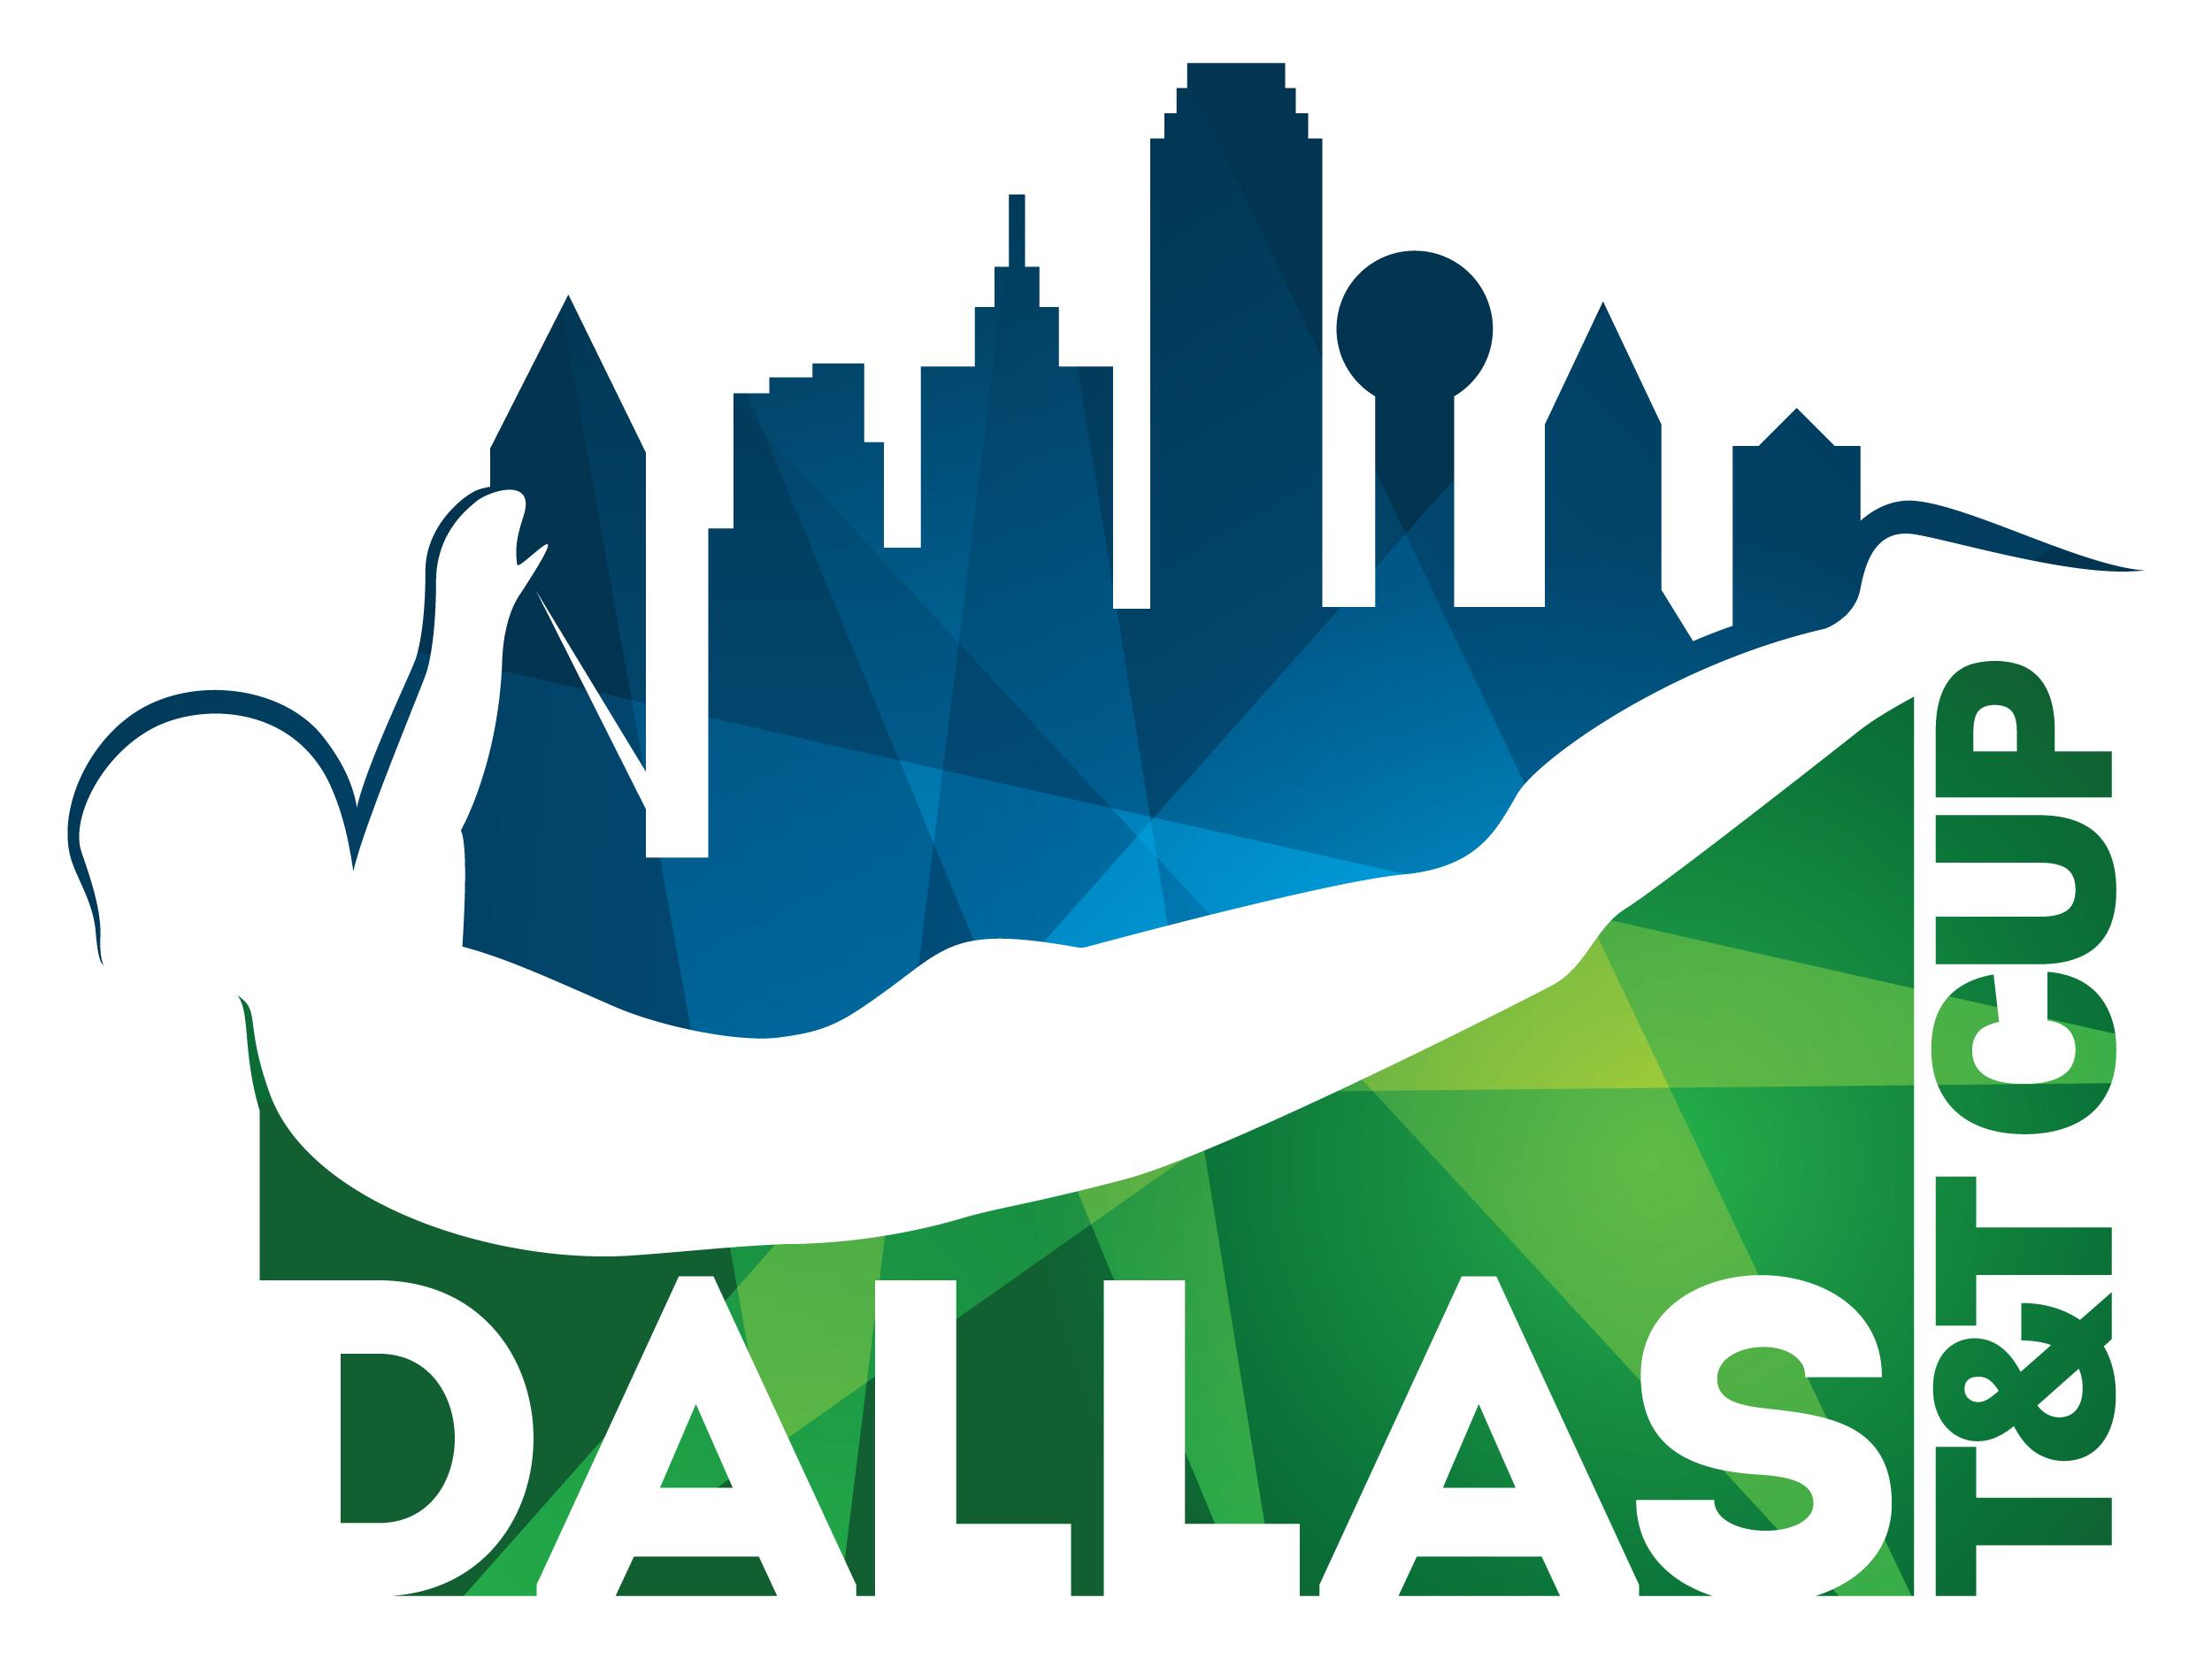 Dallas T&T Cup lights effect